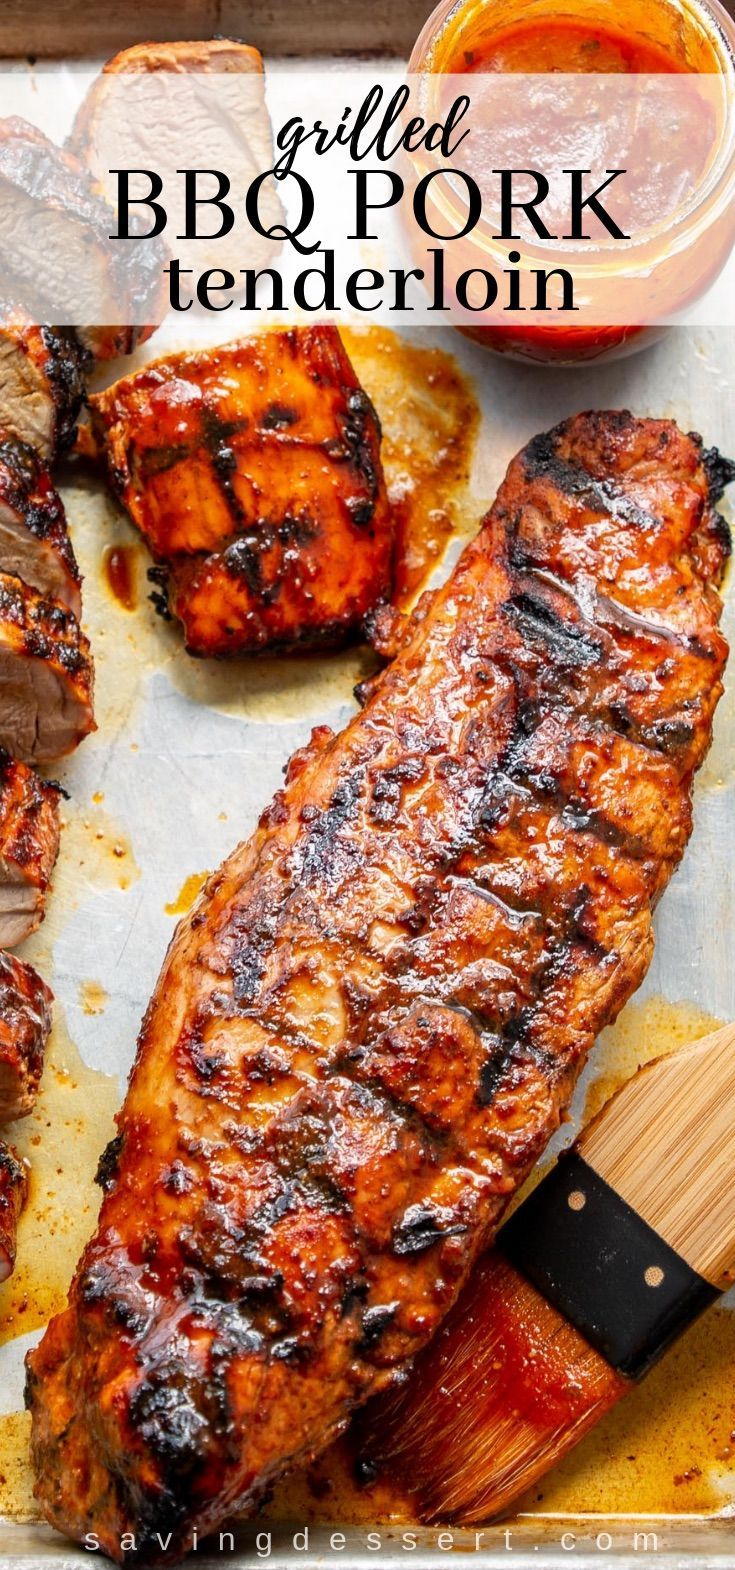 Grilled bbq pork tenderloin recipe pork tenderloin